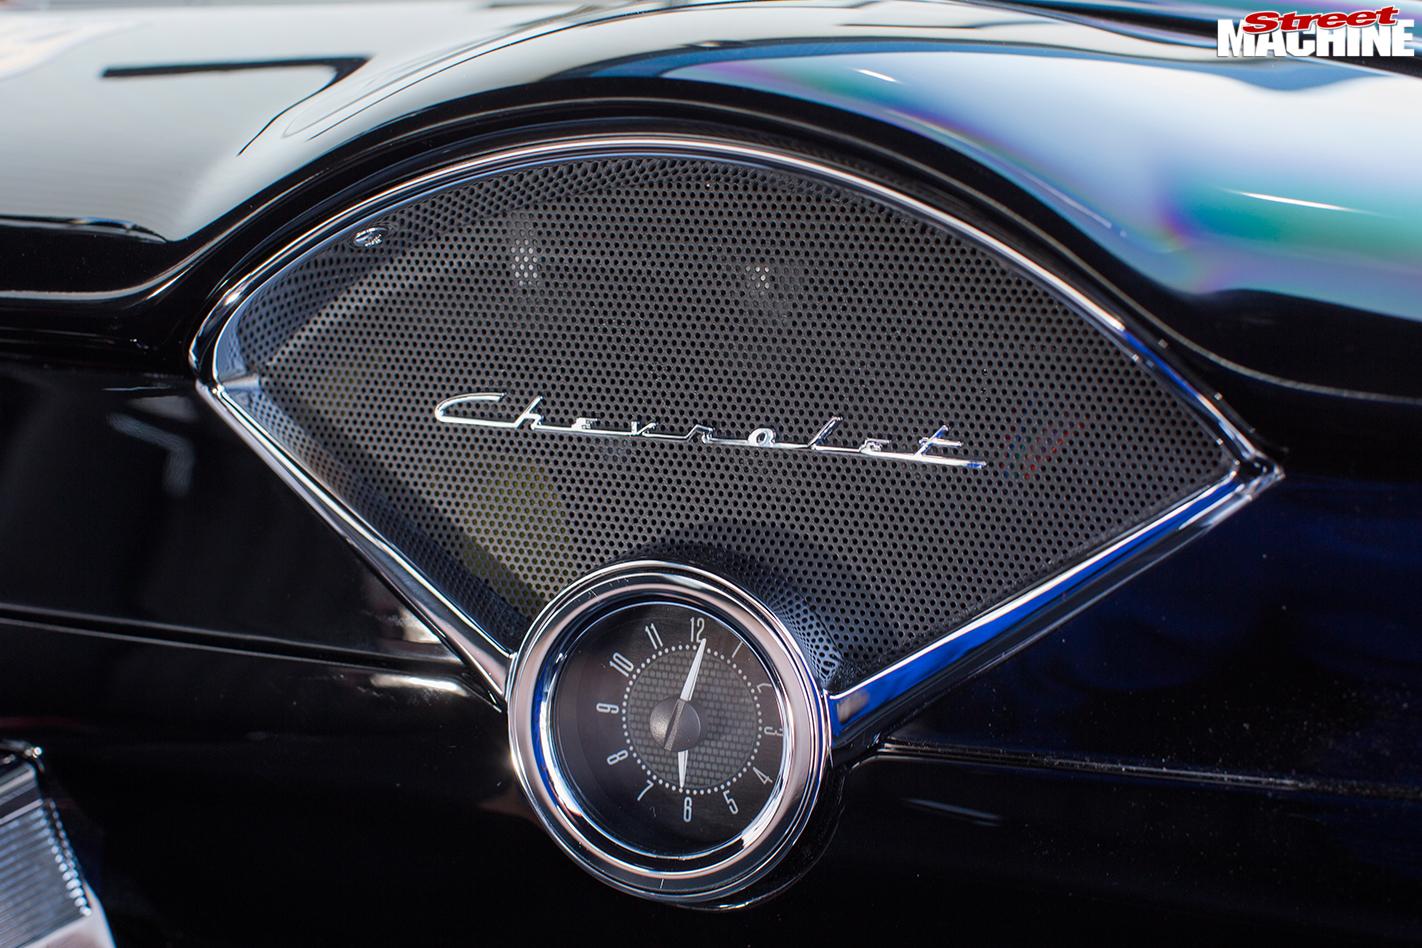 1955-chevrolet -clock